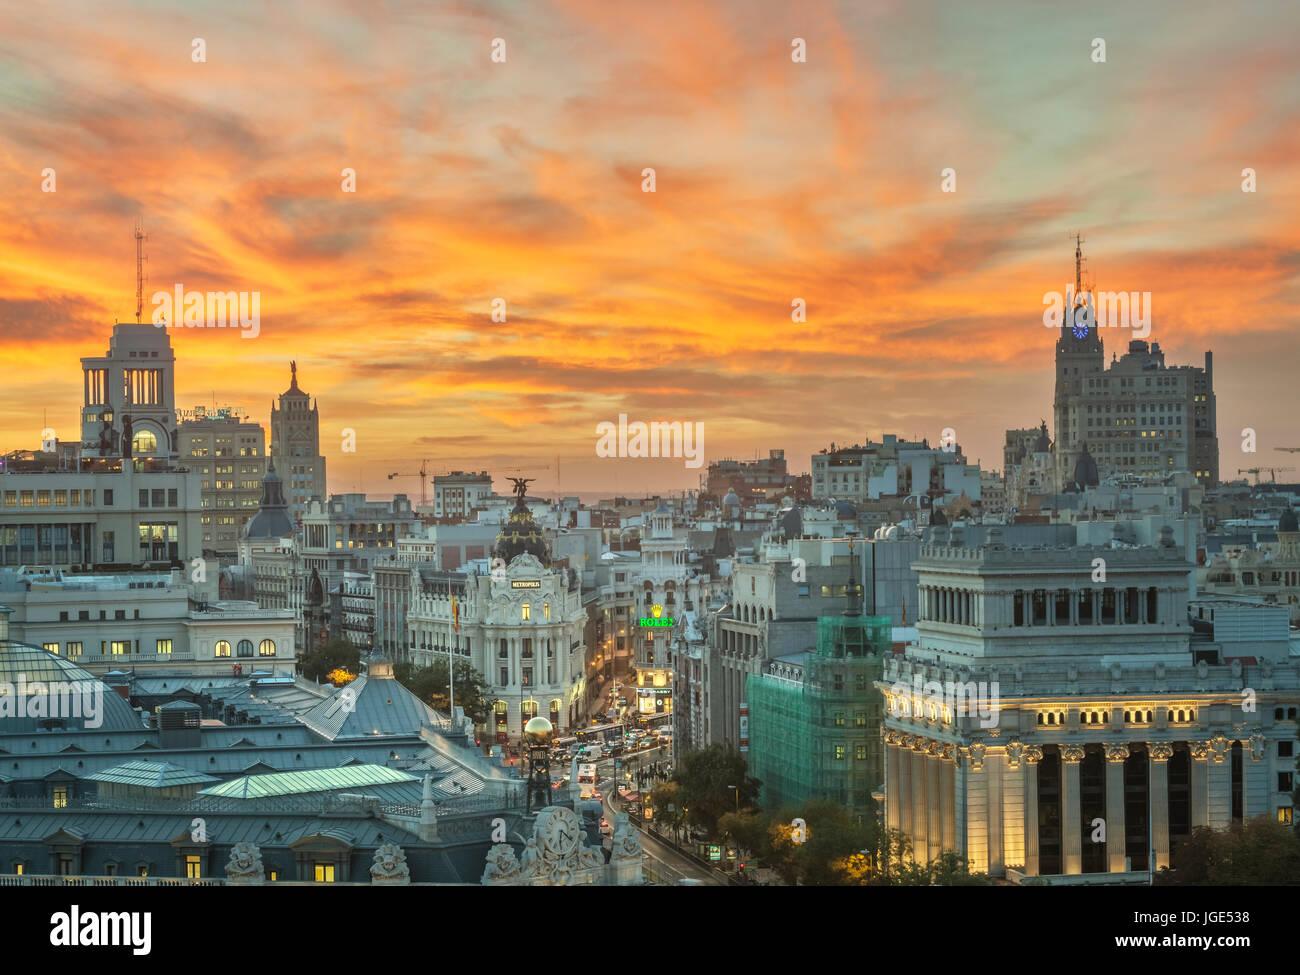 Madrid Zentrum Skyline der Stadt. Madrid, Spanien. Stockbild